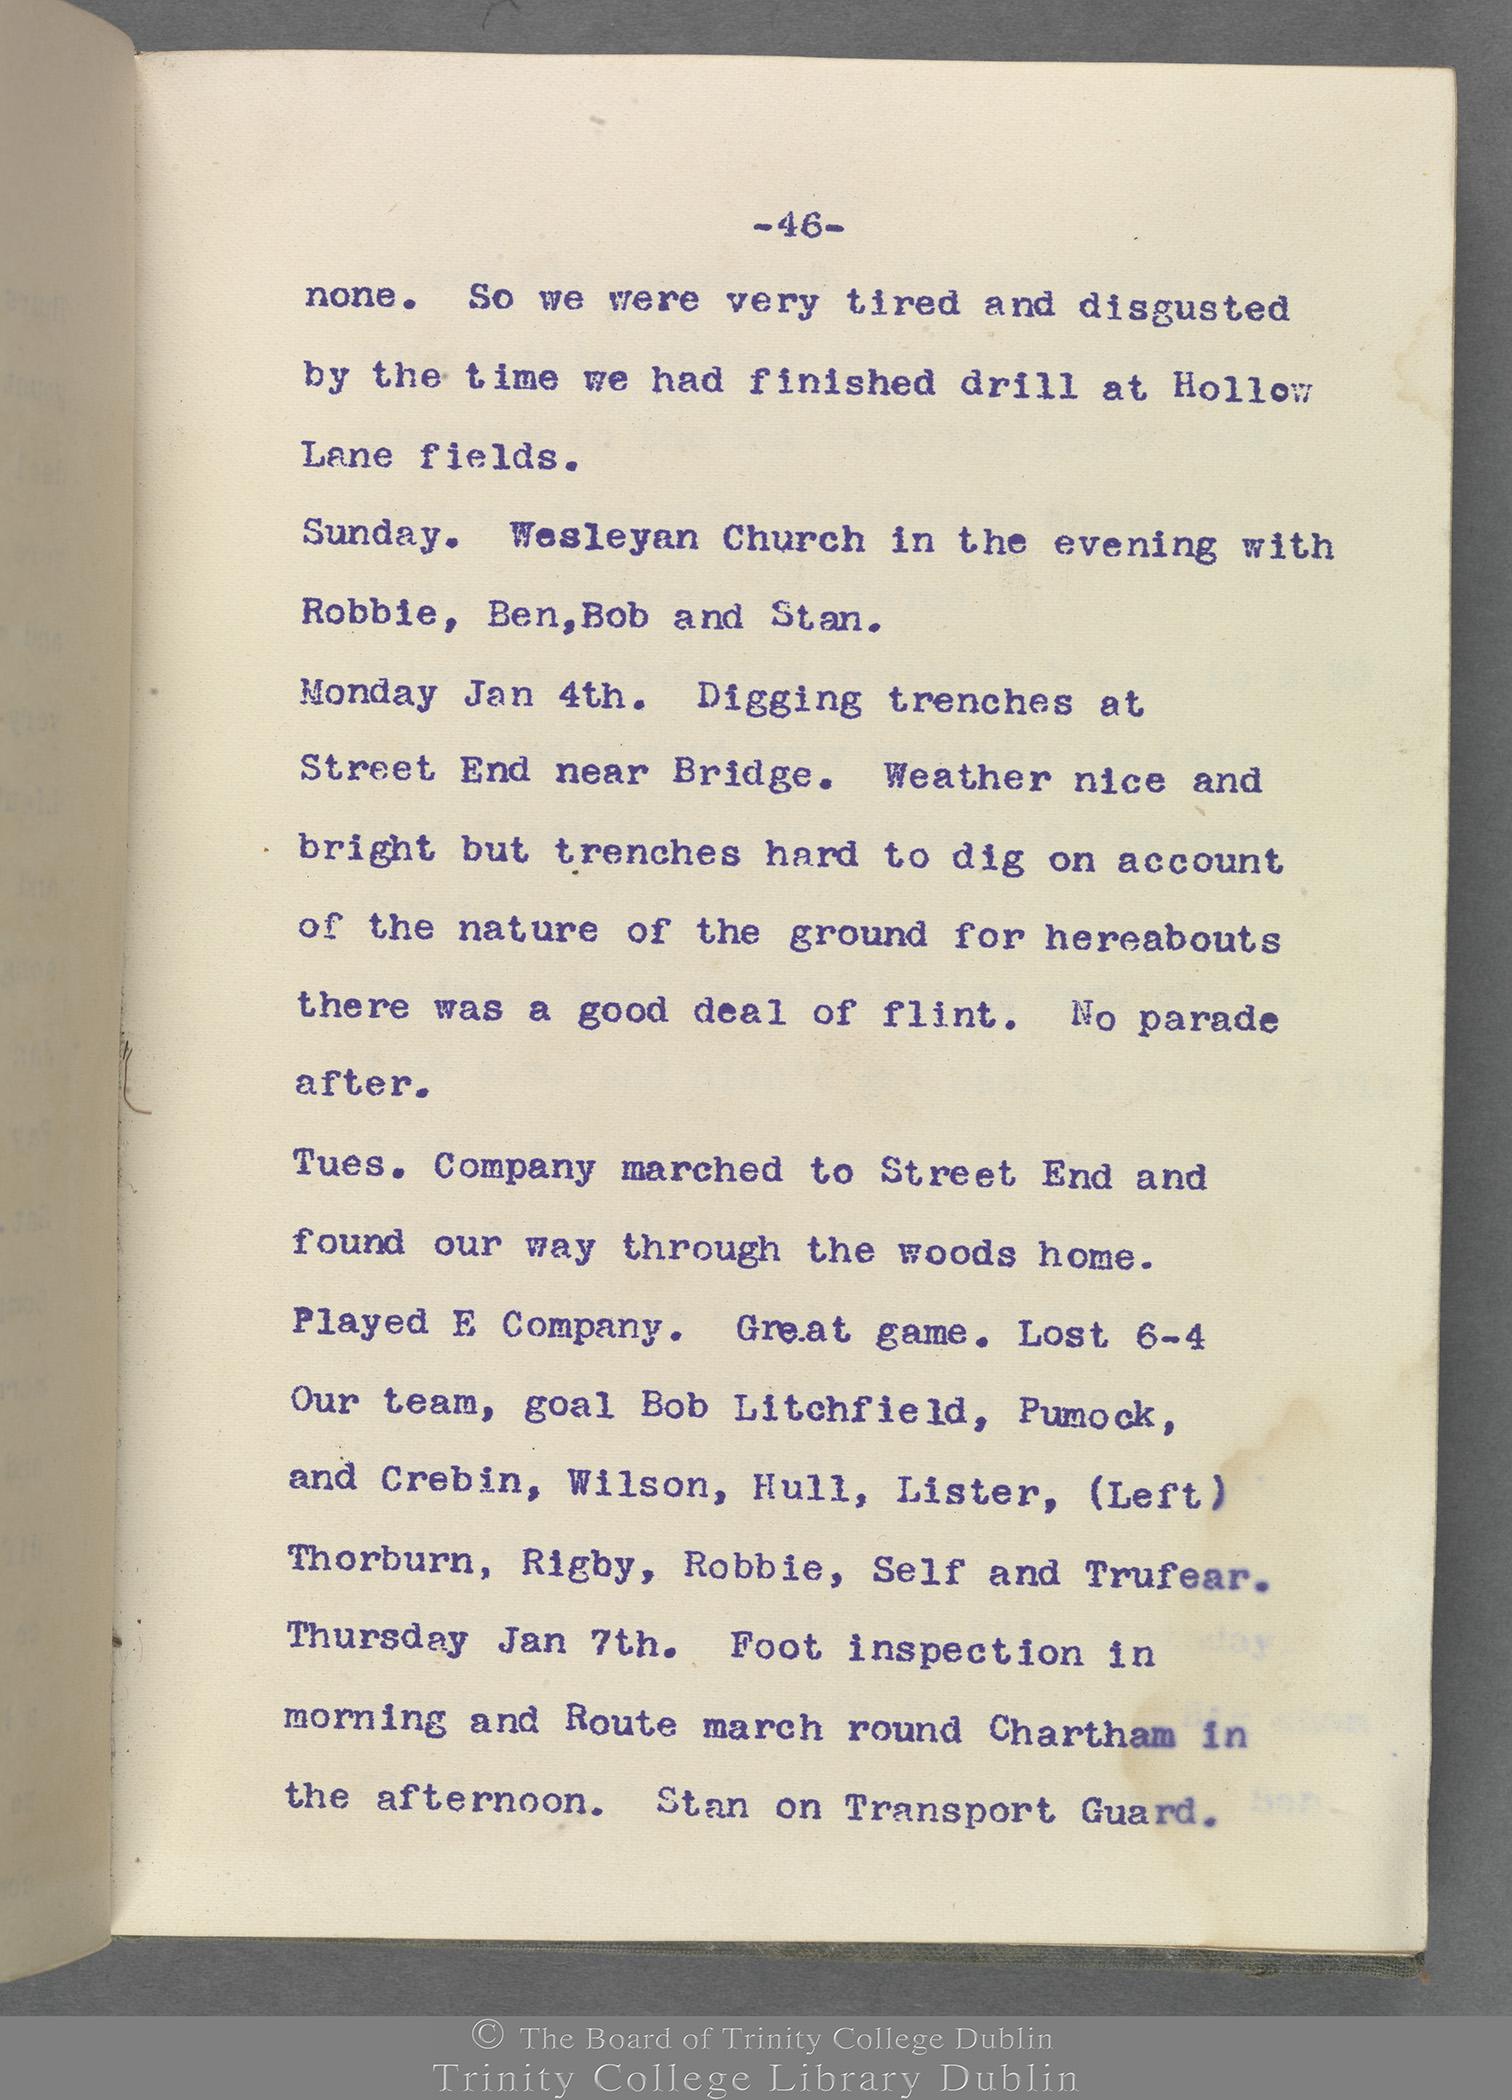 TCD MS 10853 folio 46 recto